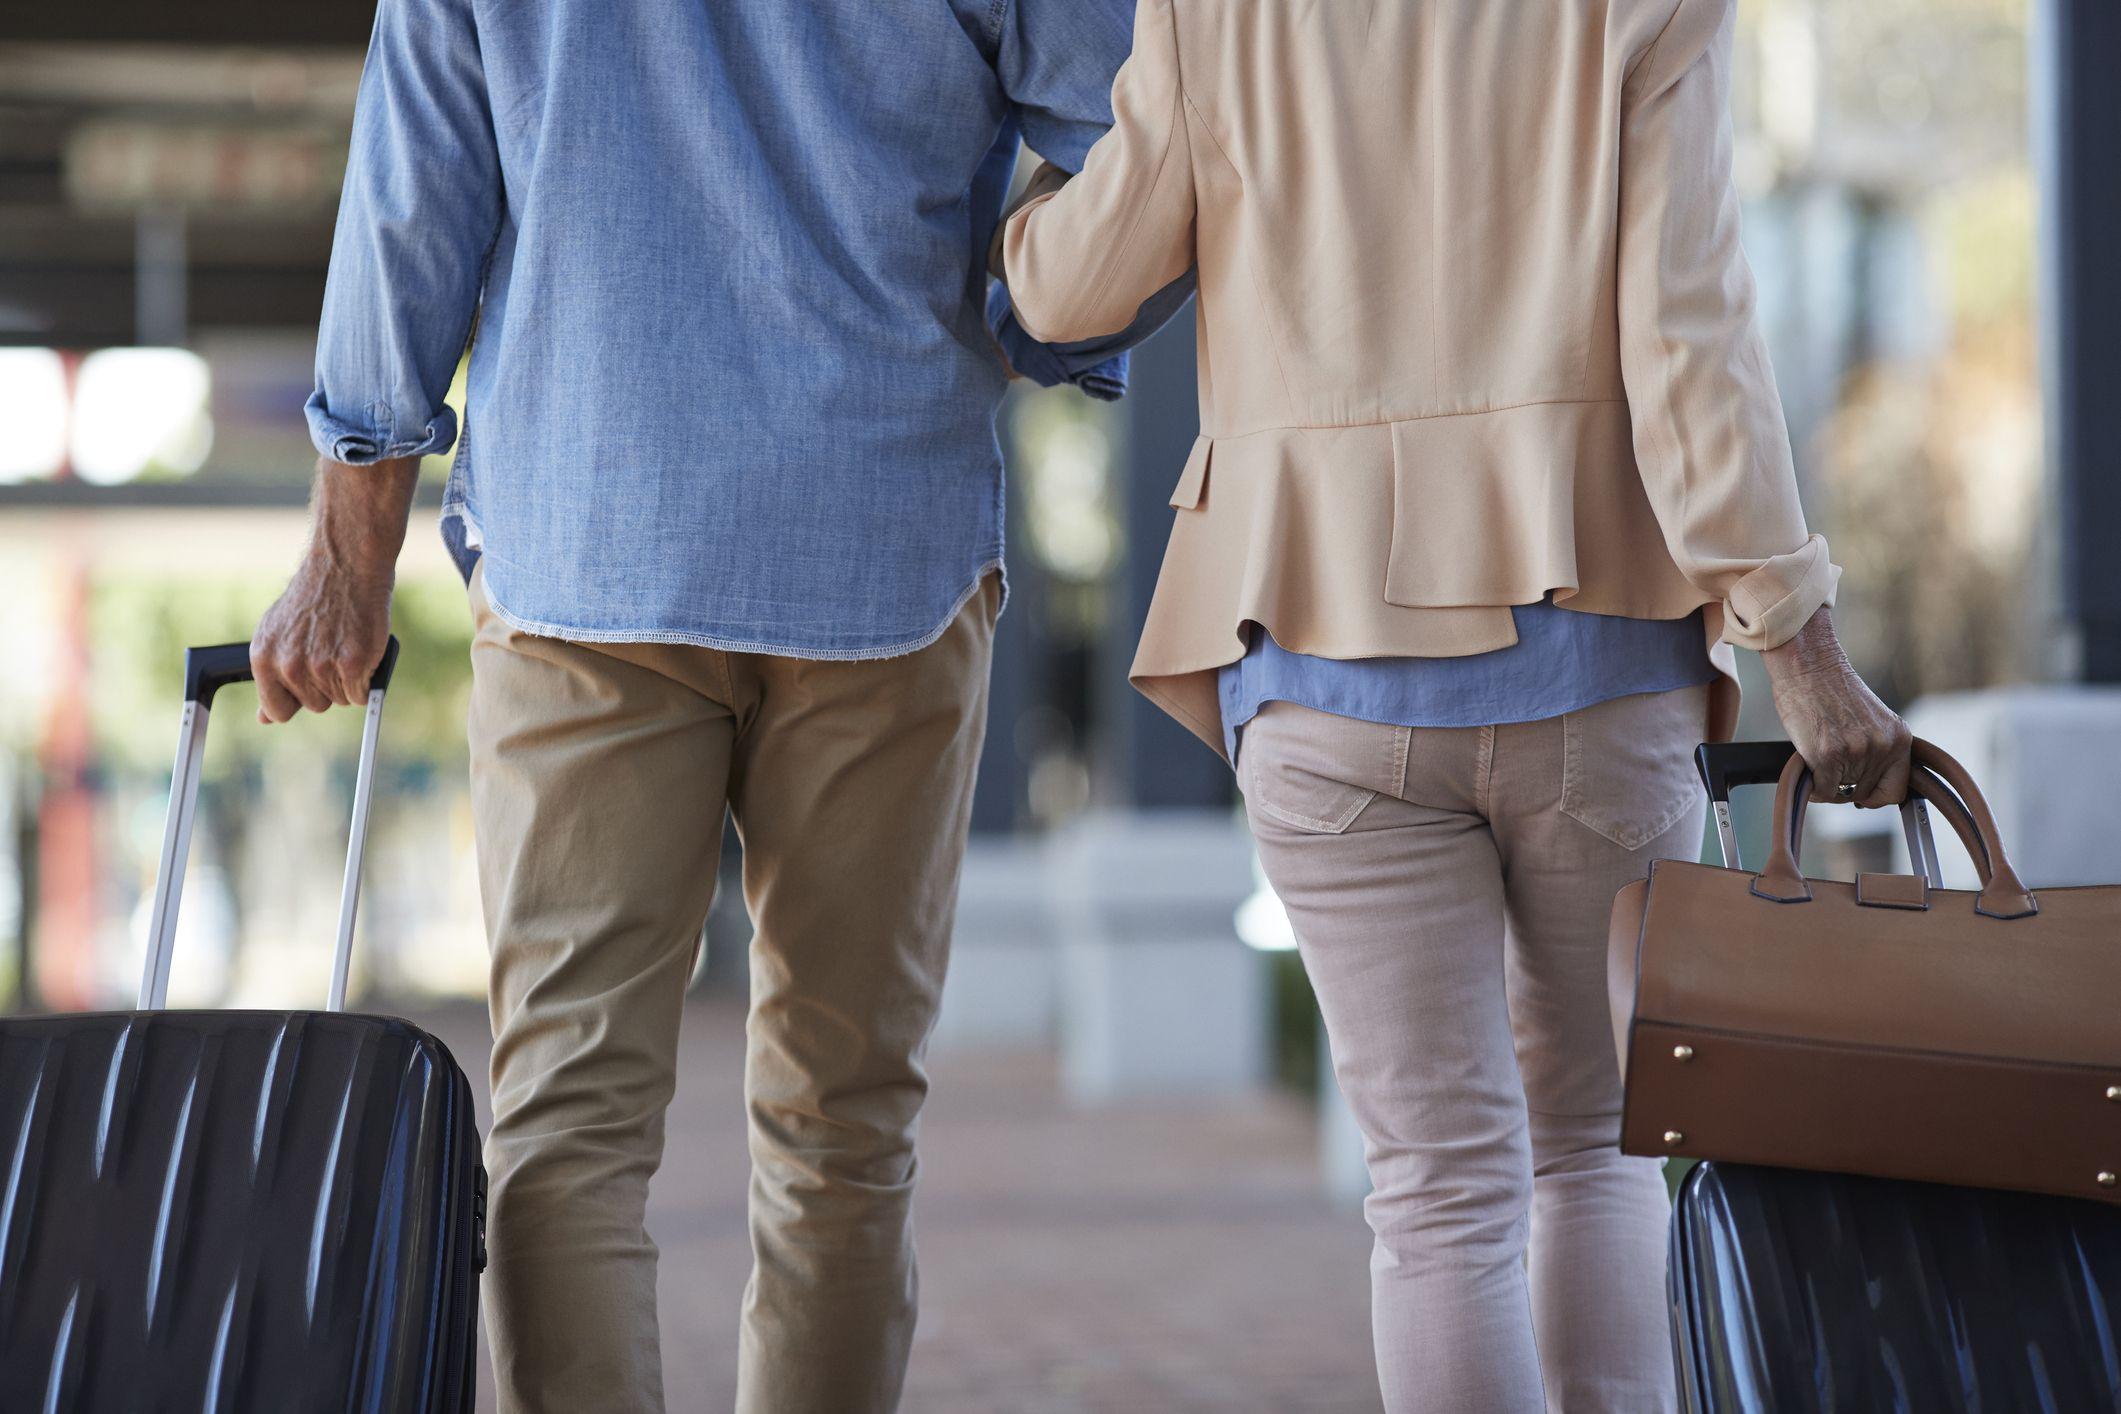 Senior couple walking together on public transport station